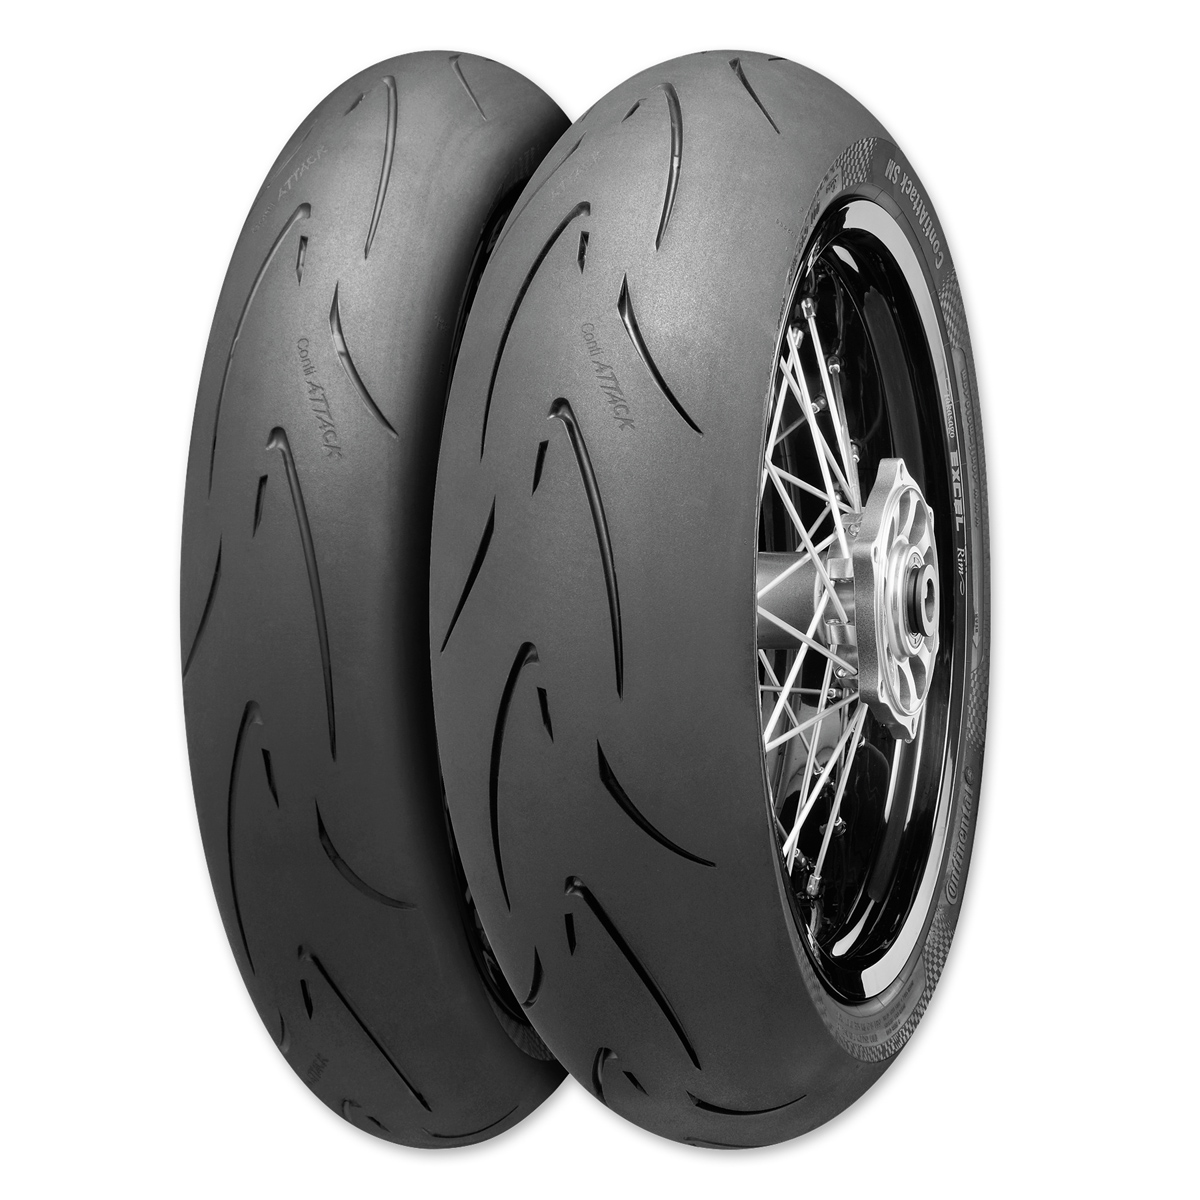 Continental Attack SM 160/60HR17 Rear Tire